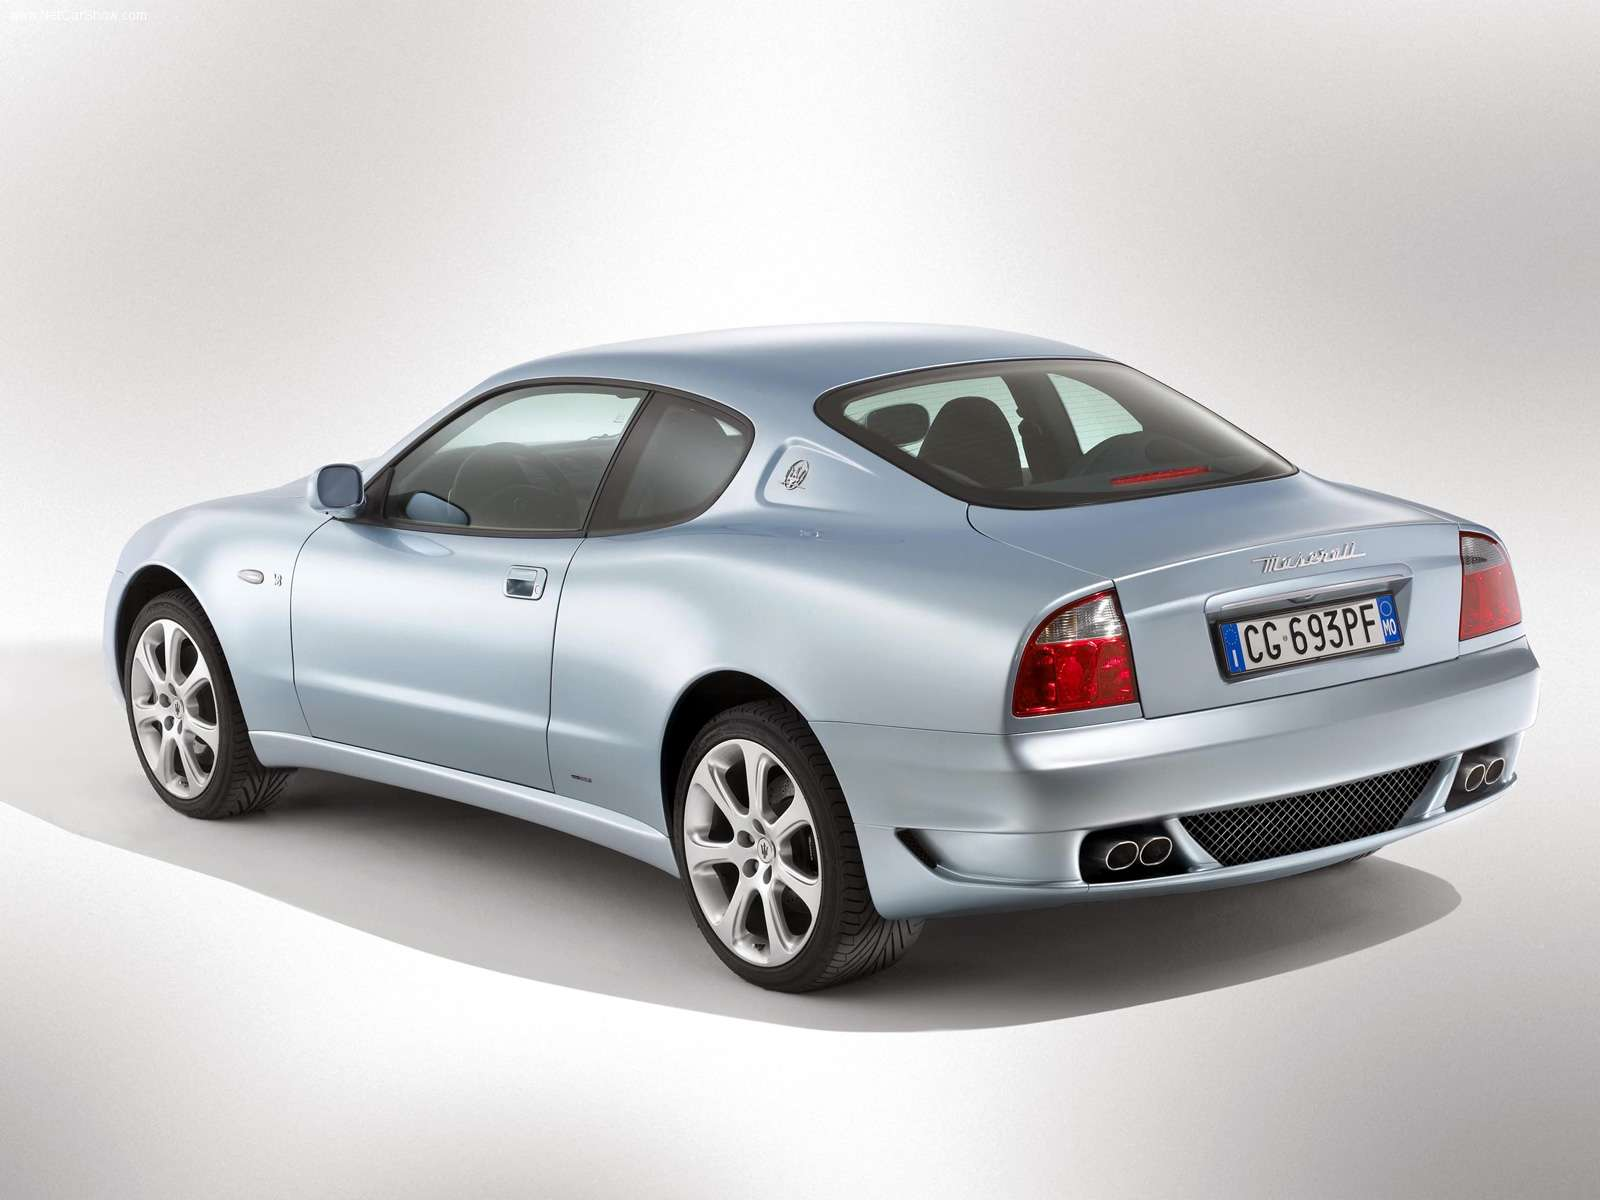 Hình ảnh siêu xe Maserati Coupe 2005 & nội ngoại thất